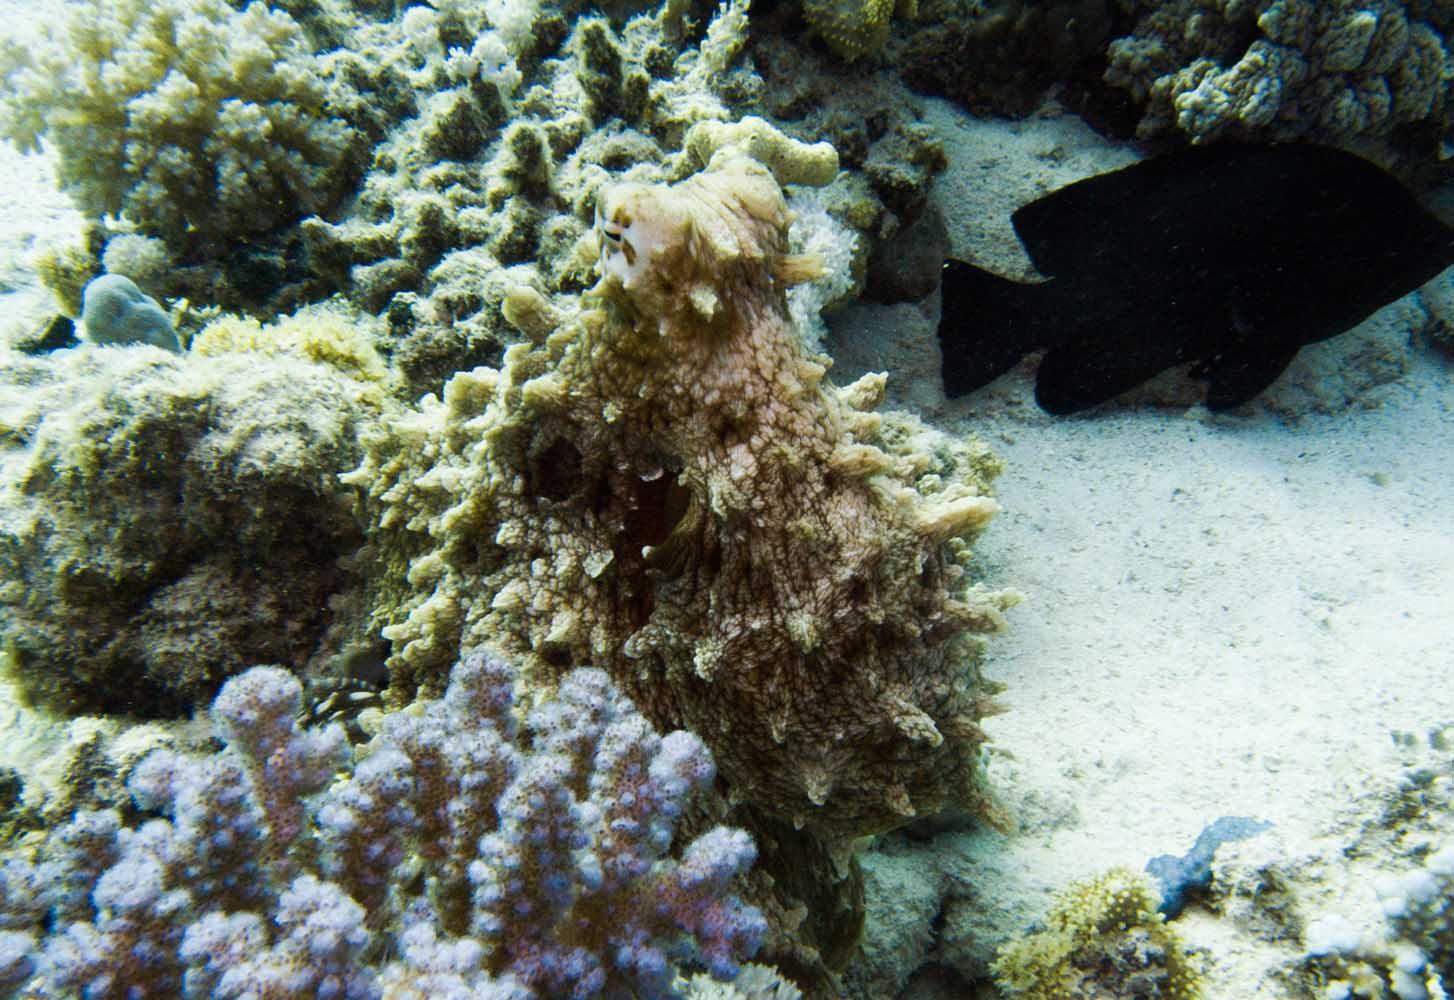 Marsa_Alam_Marsa_Shagra_Red Sea Diving Safari-22